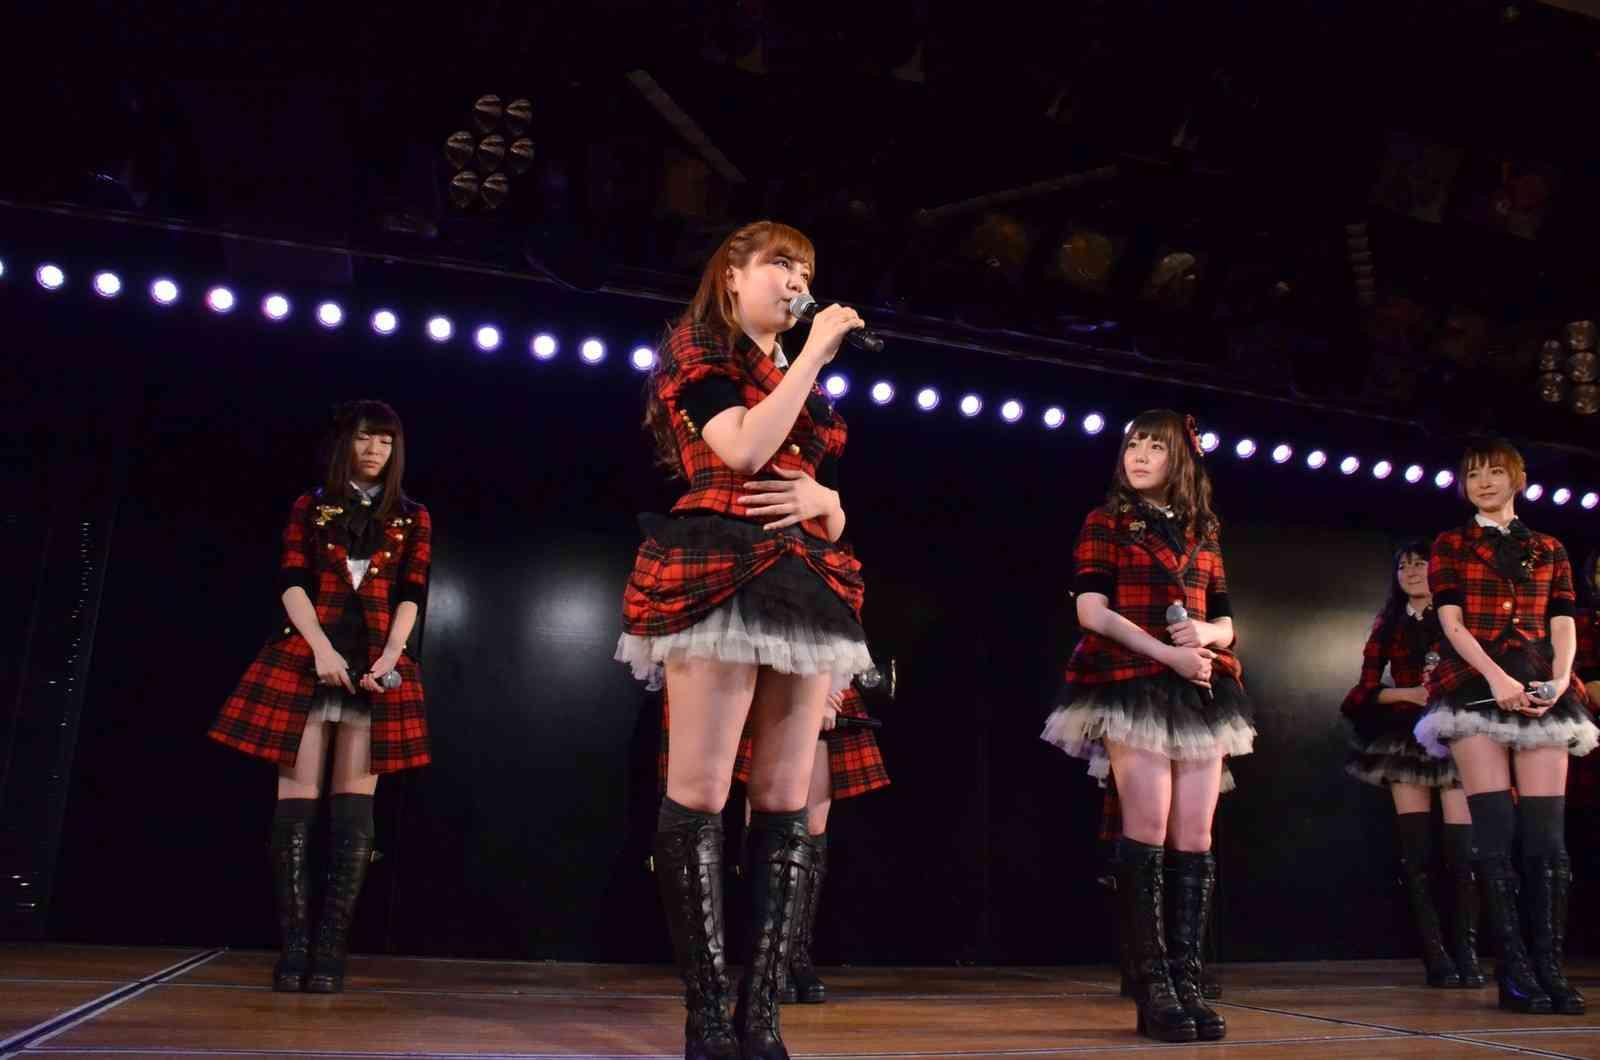 AKB48河西智美、卒業公演でファンから大きな「とも~み」コールが巻き起こり涙